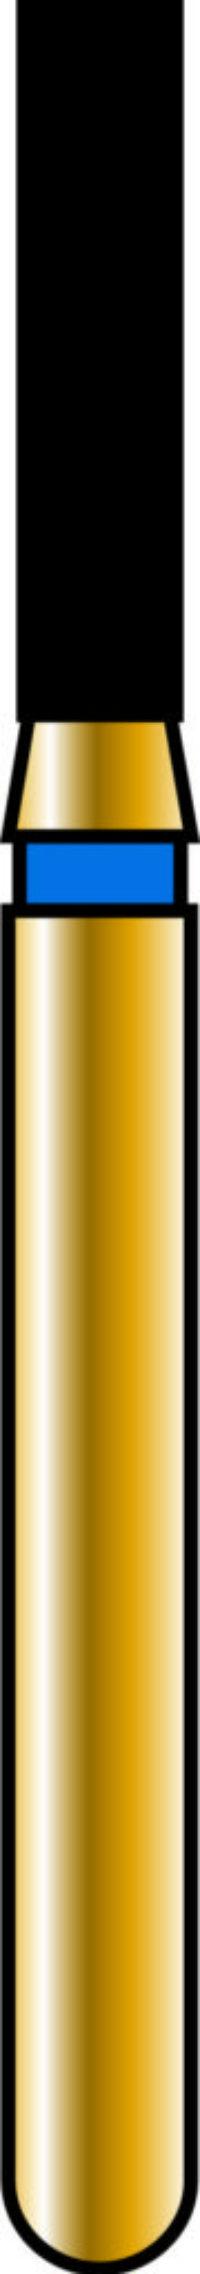 Flat End Cylinder 14-6mm Gold Diamond Bur